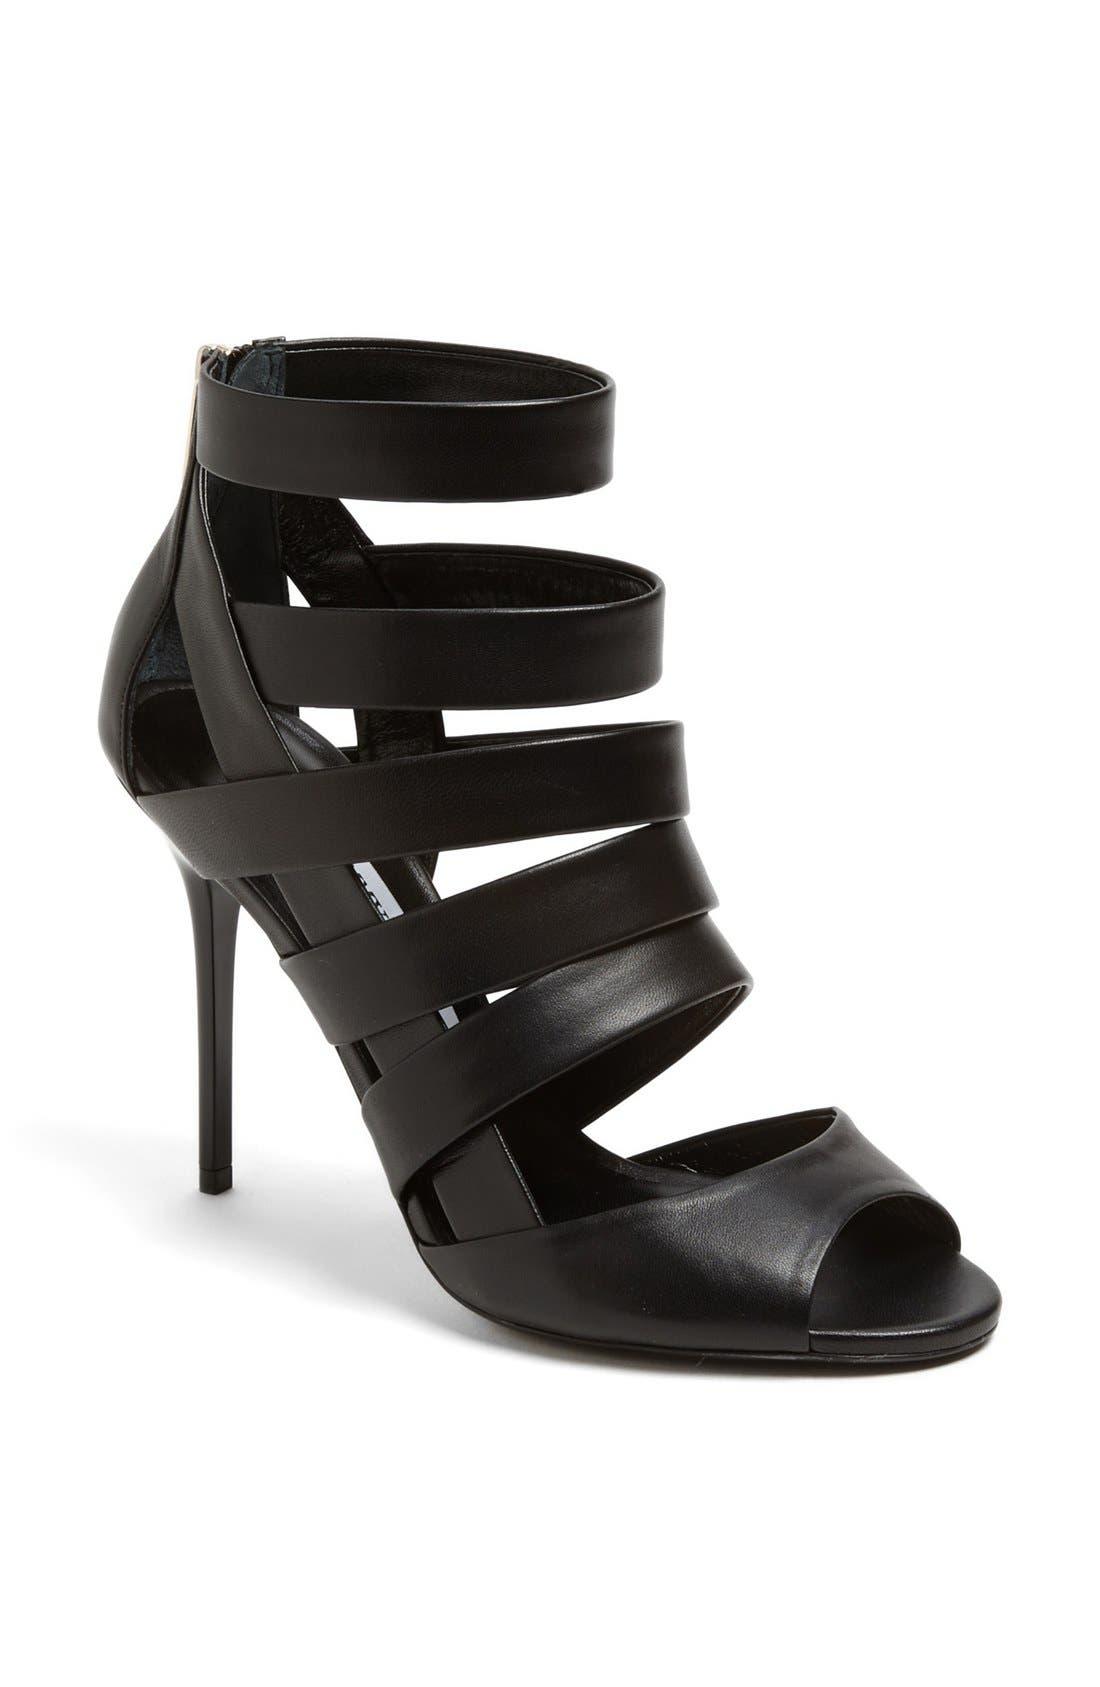 Main Image - Jimmy Choo 'Dame' Sandal